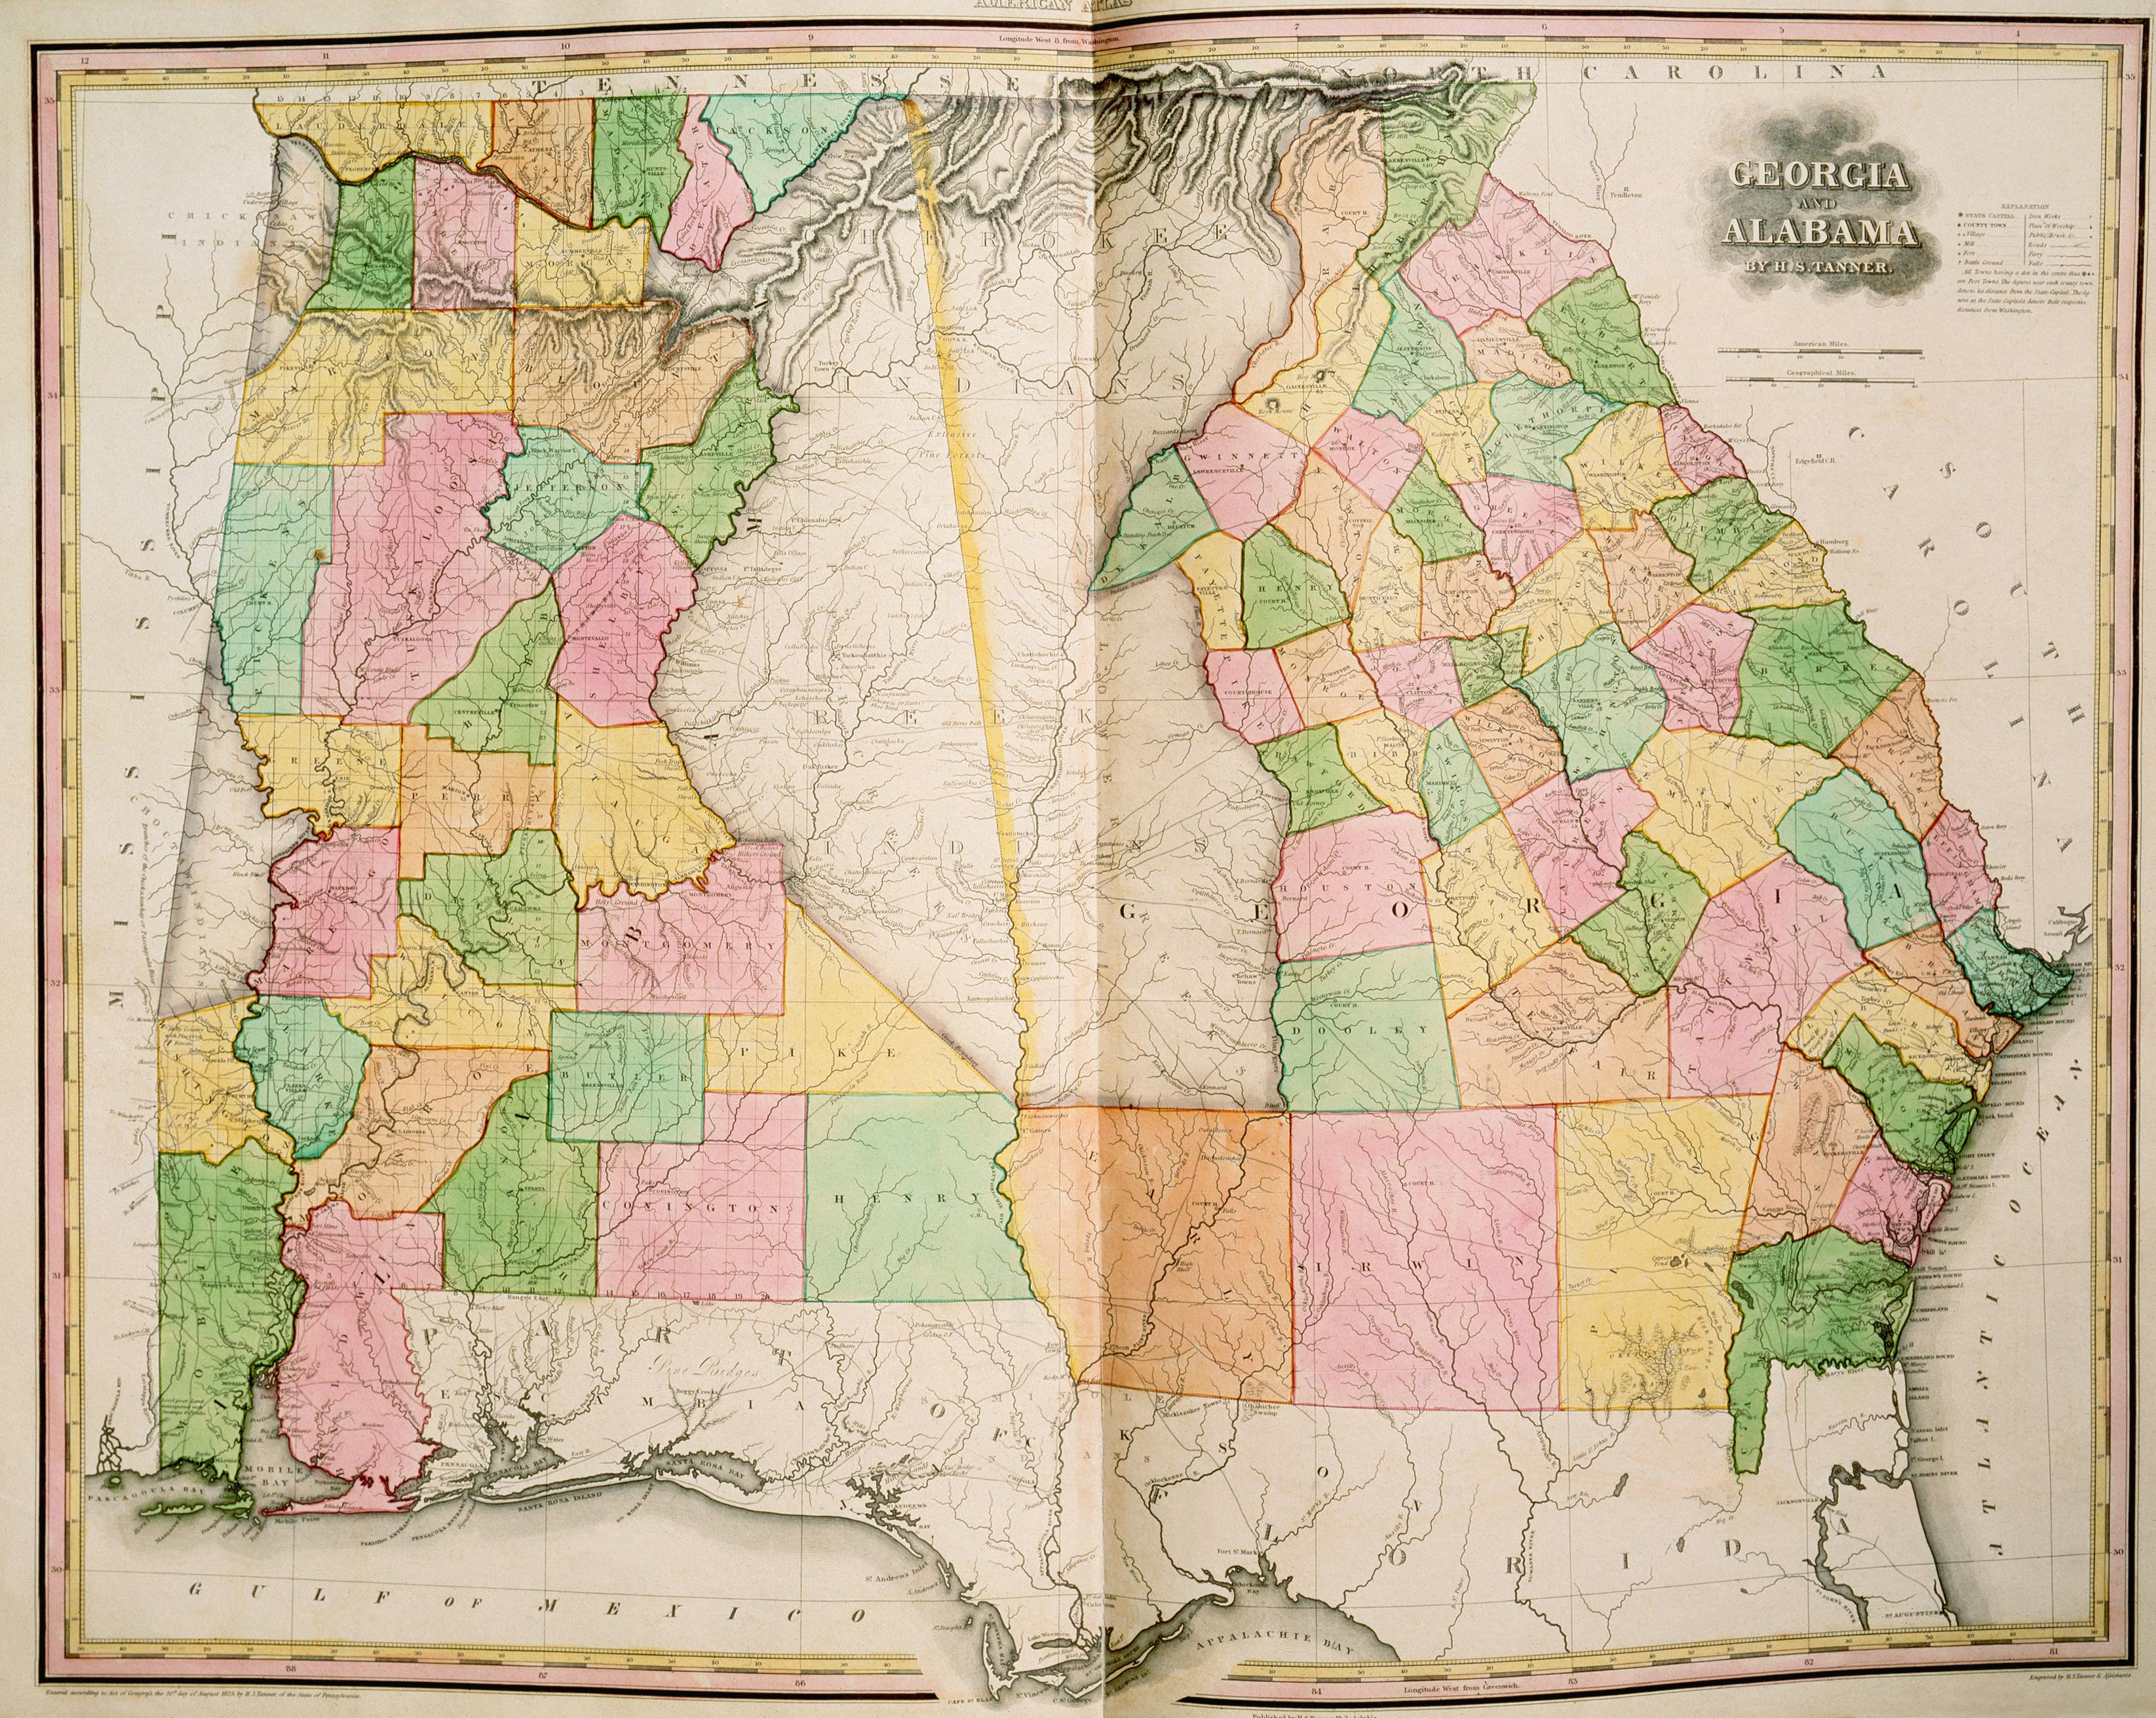 Georgiaandalabamapriortothetrailoftears Native American - 1823 us map